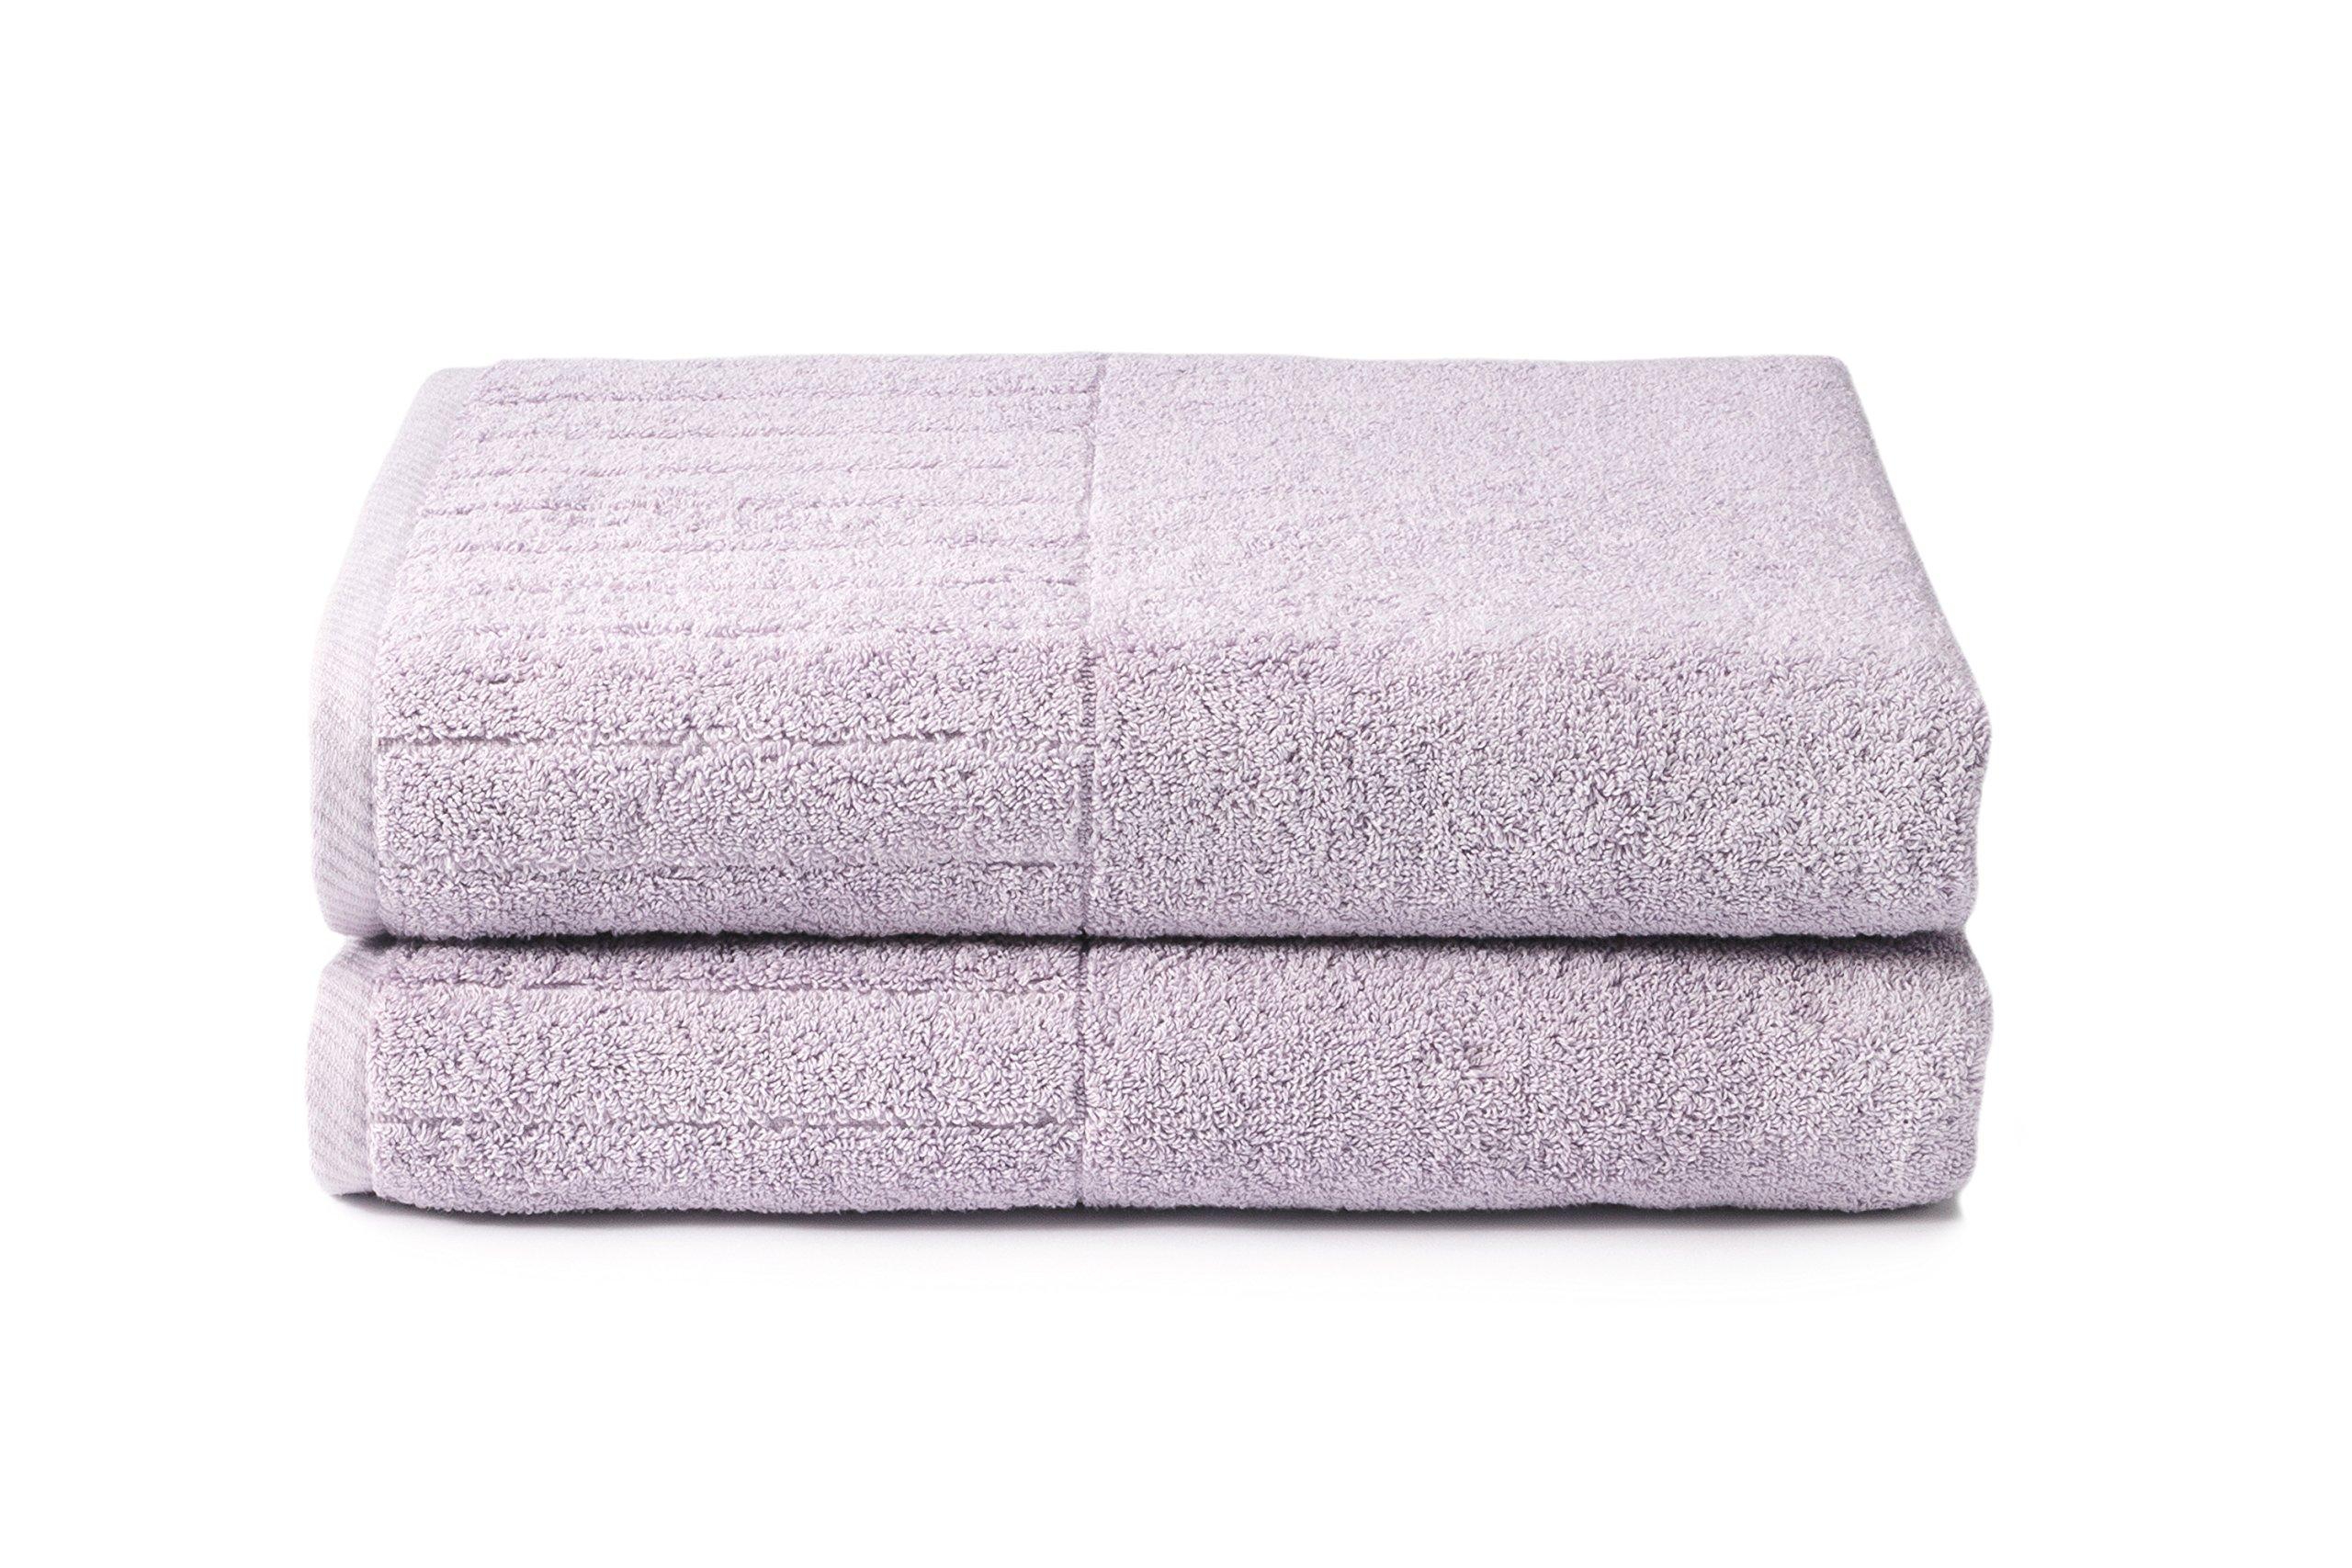 Texere 100% Organic Cotton Bath Sheets (2-Pack, Orchid Hush) Eco-Friendly Christmas Kwanza Hanukah Gift Ideas